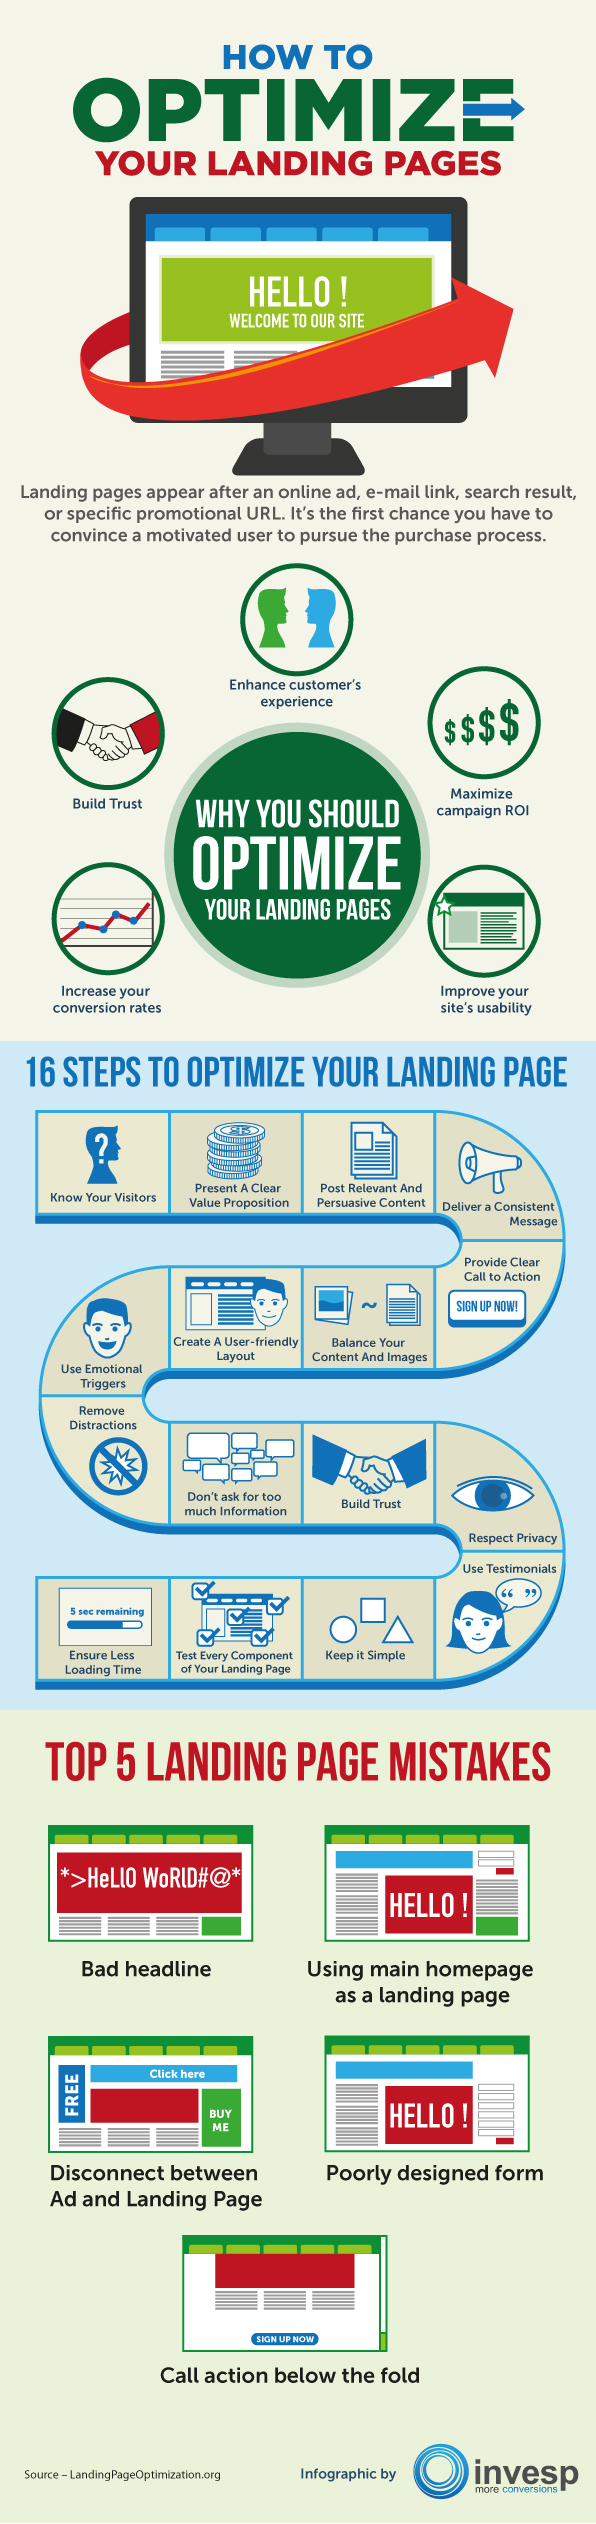 16 pasos para optimizar landing pages